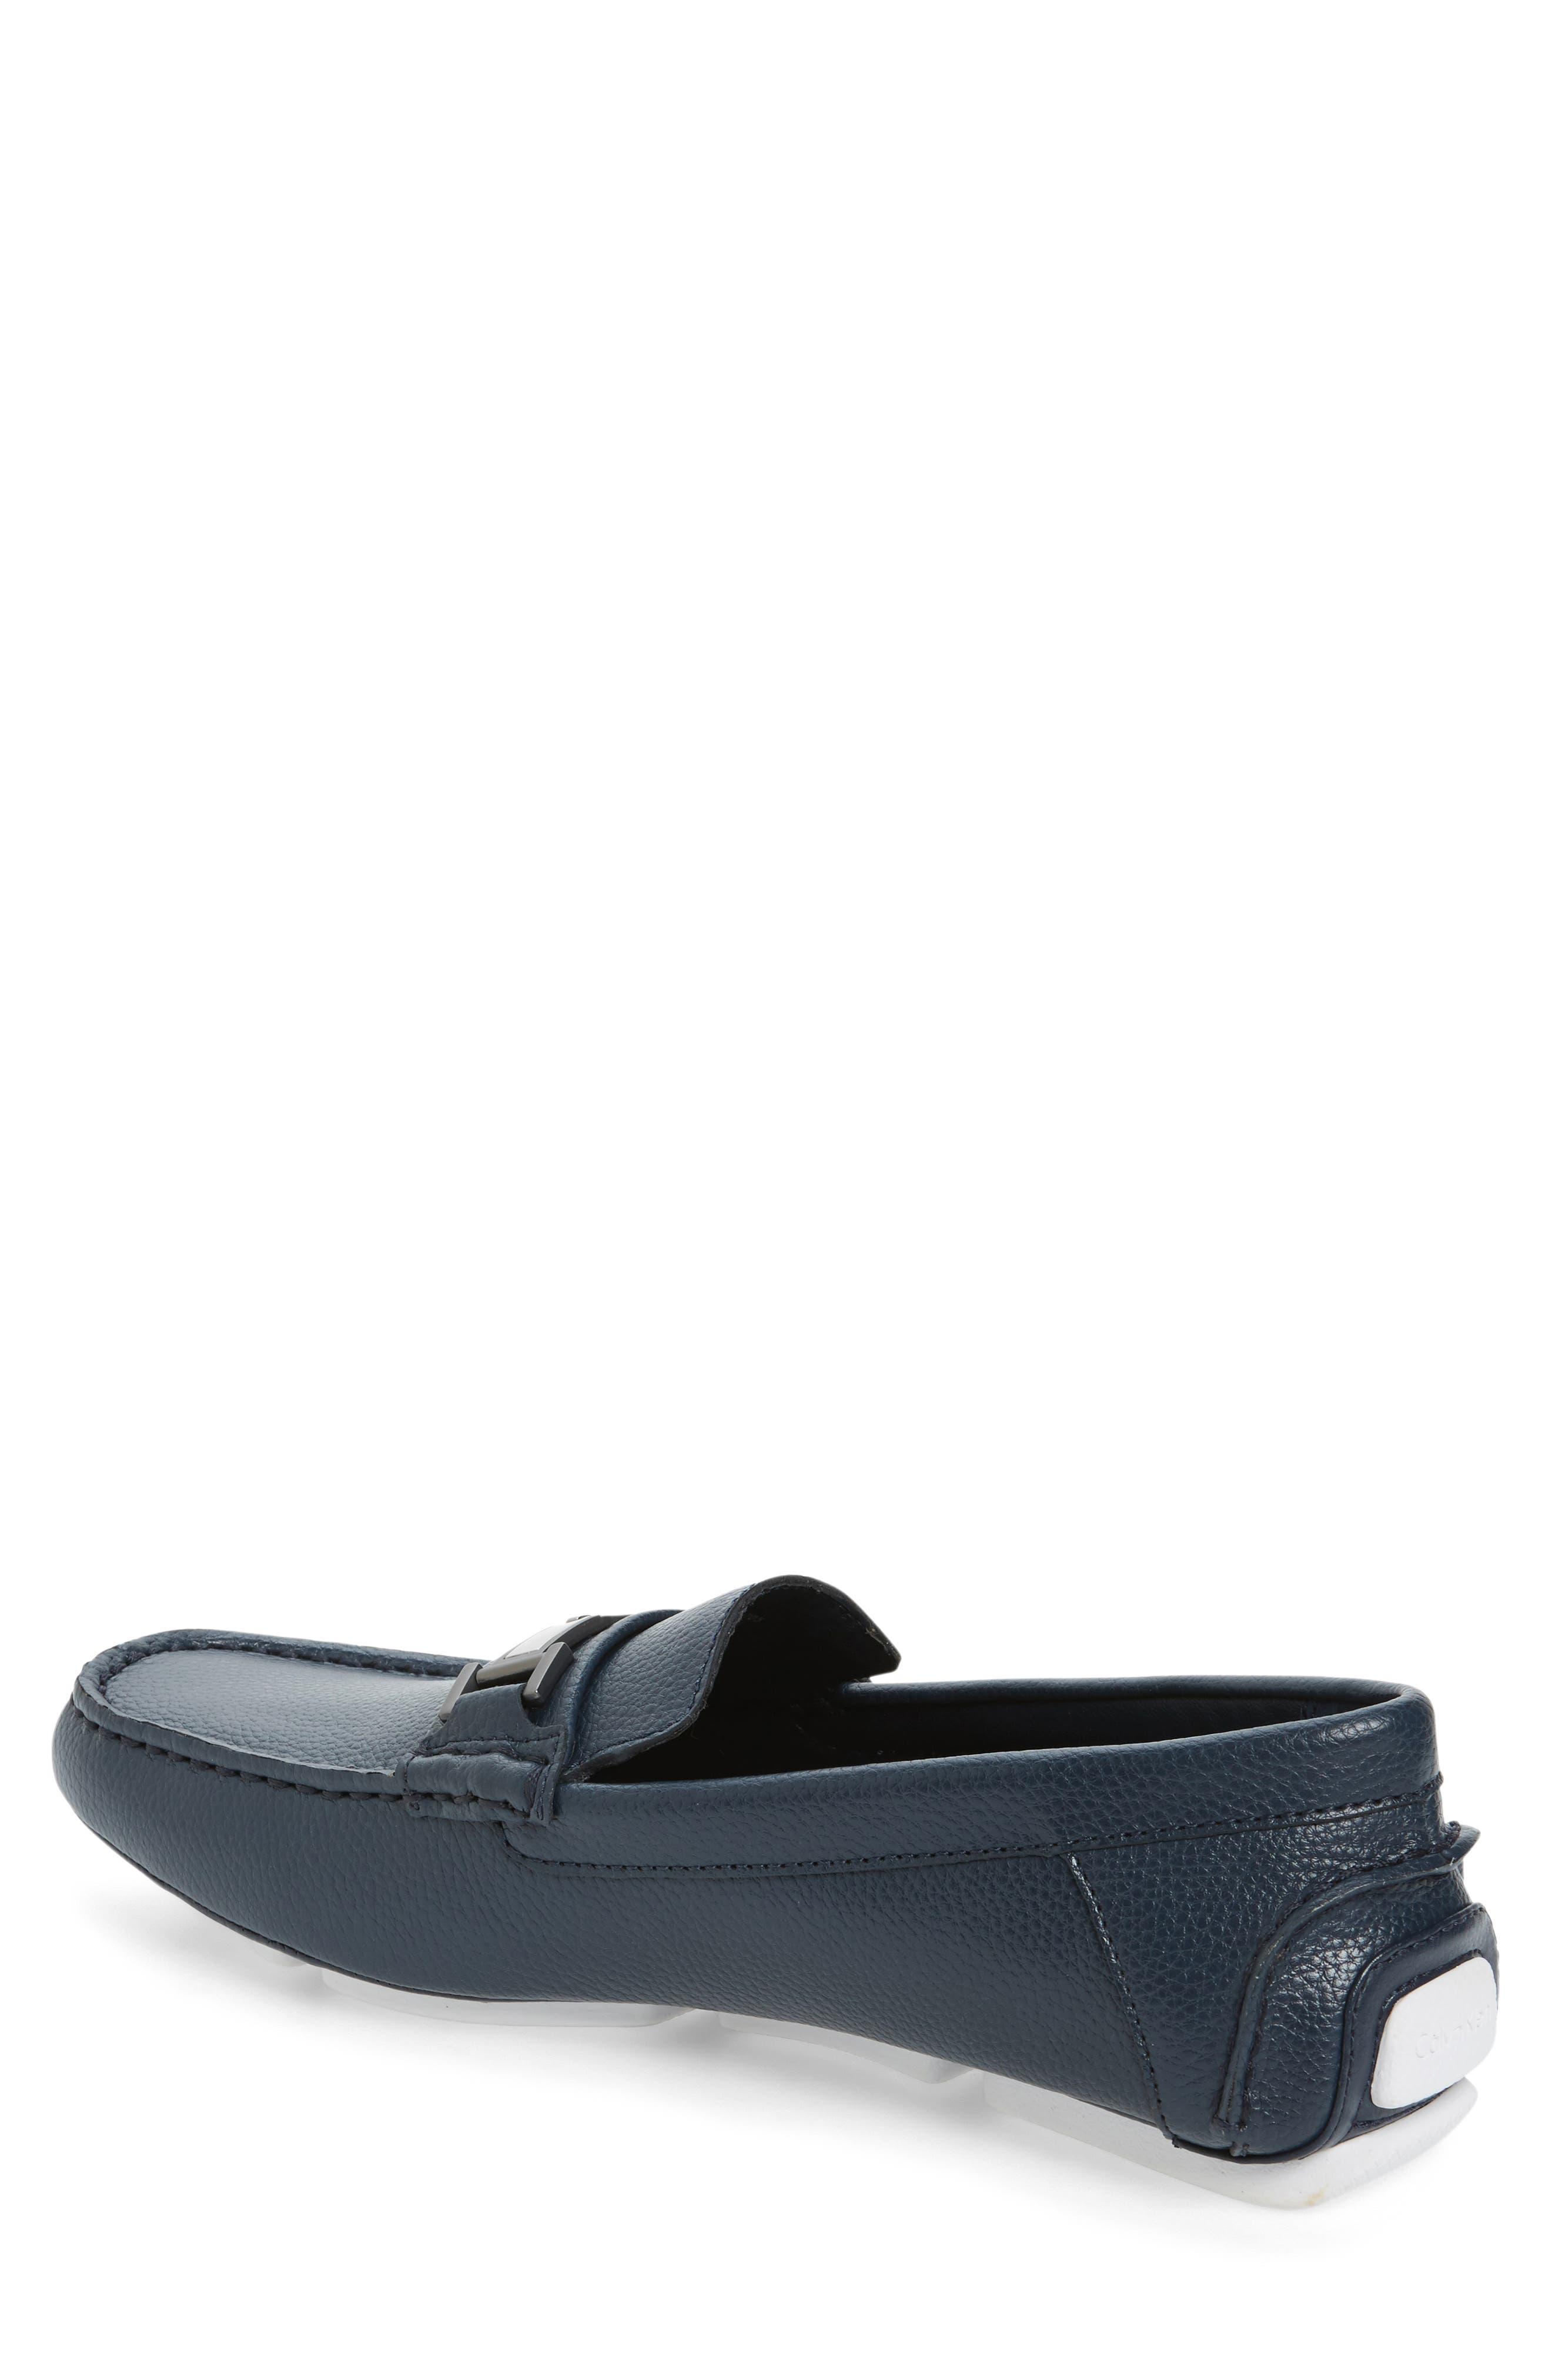 Alternate Image 2  - Calvin Klein Magnus Driving Shoe (Men)